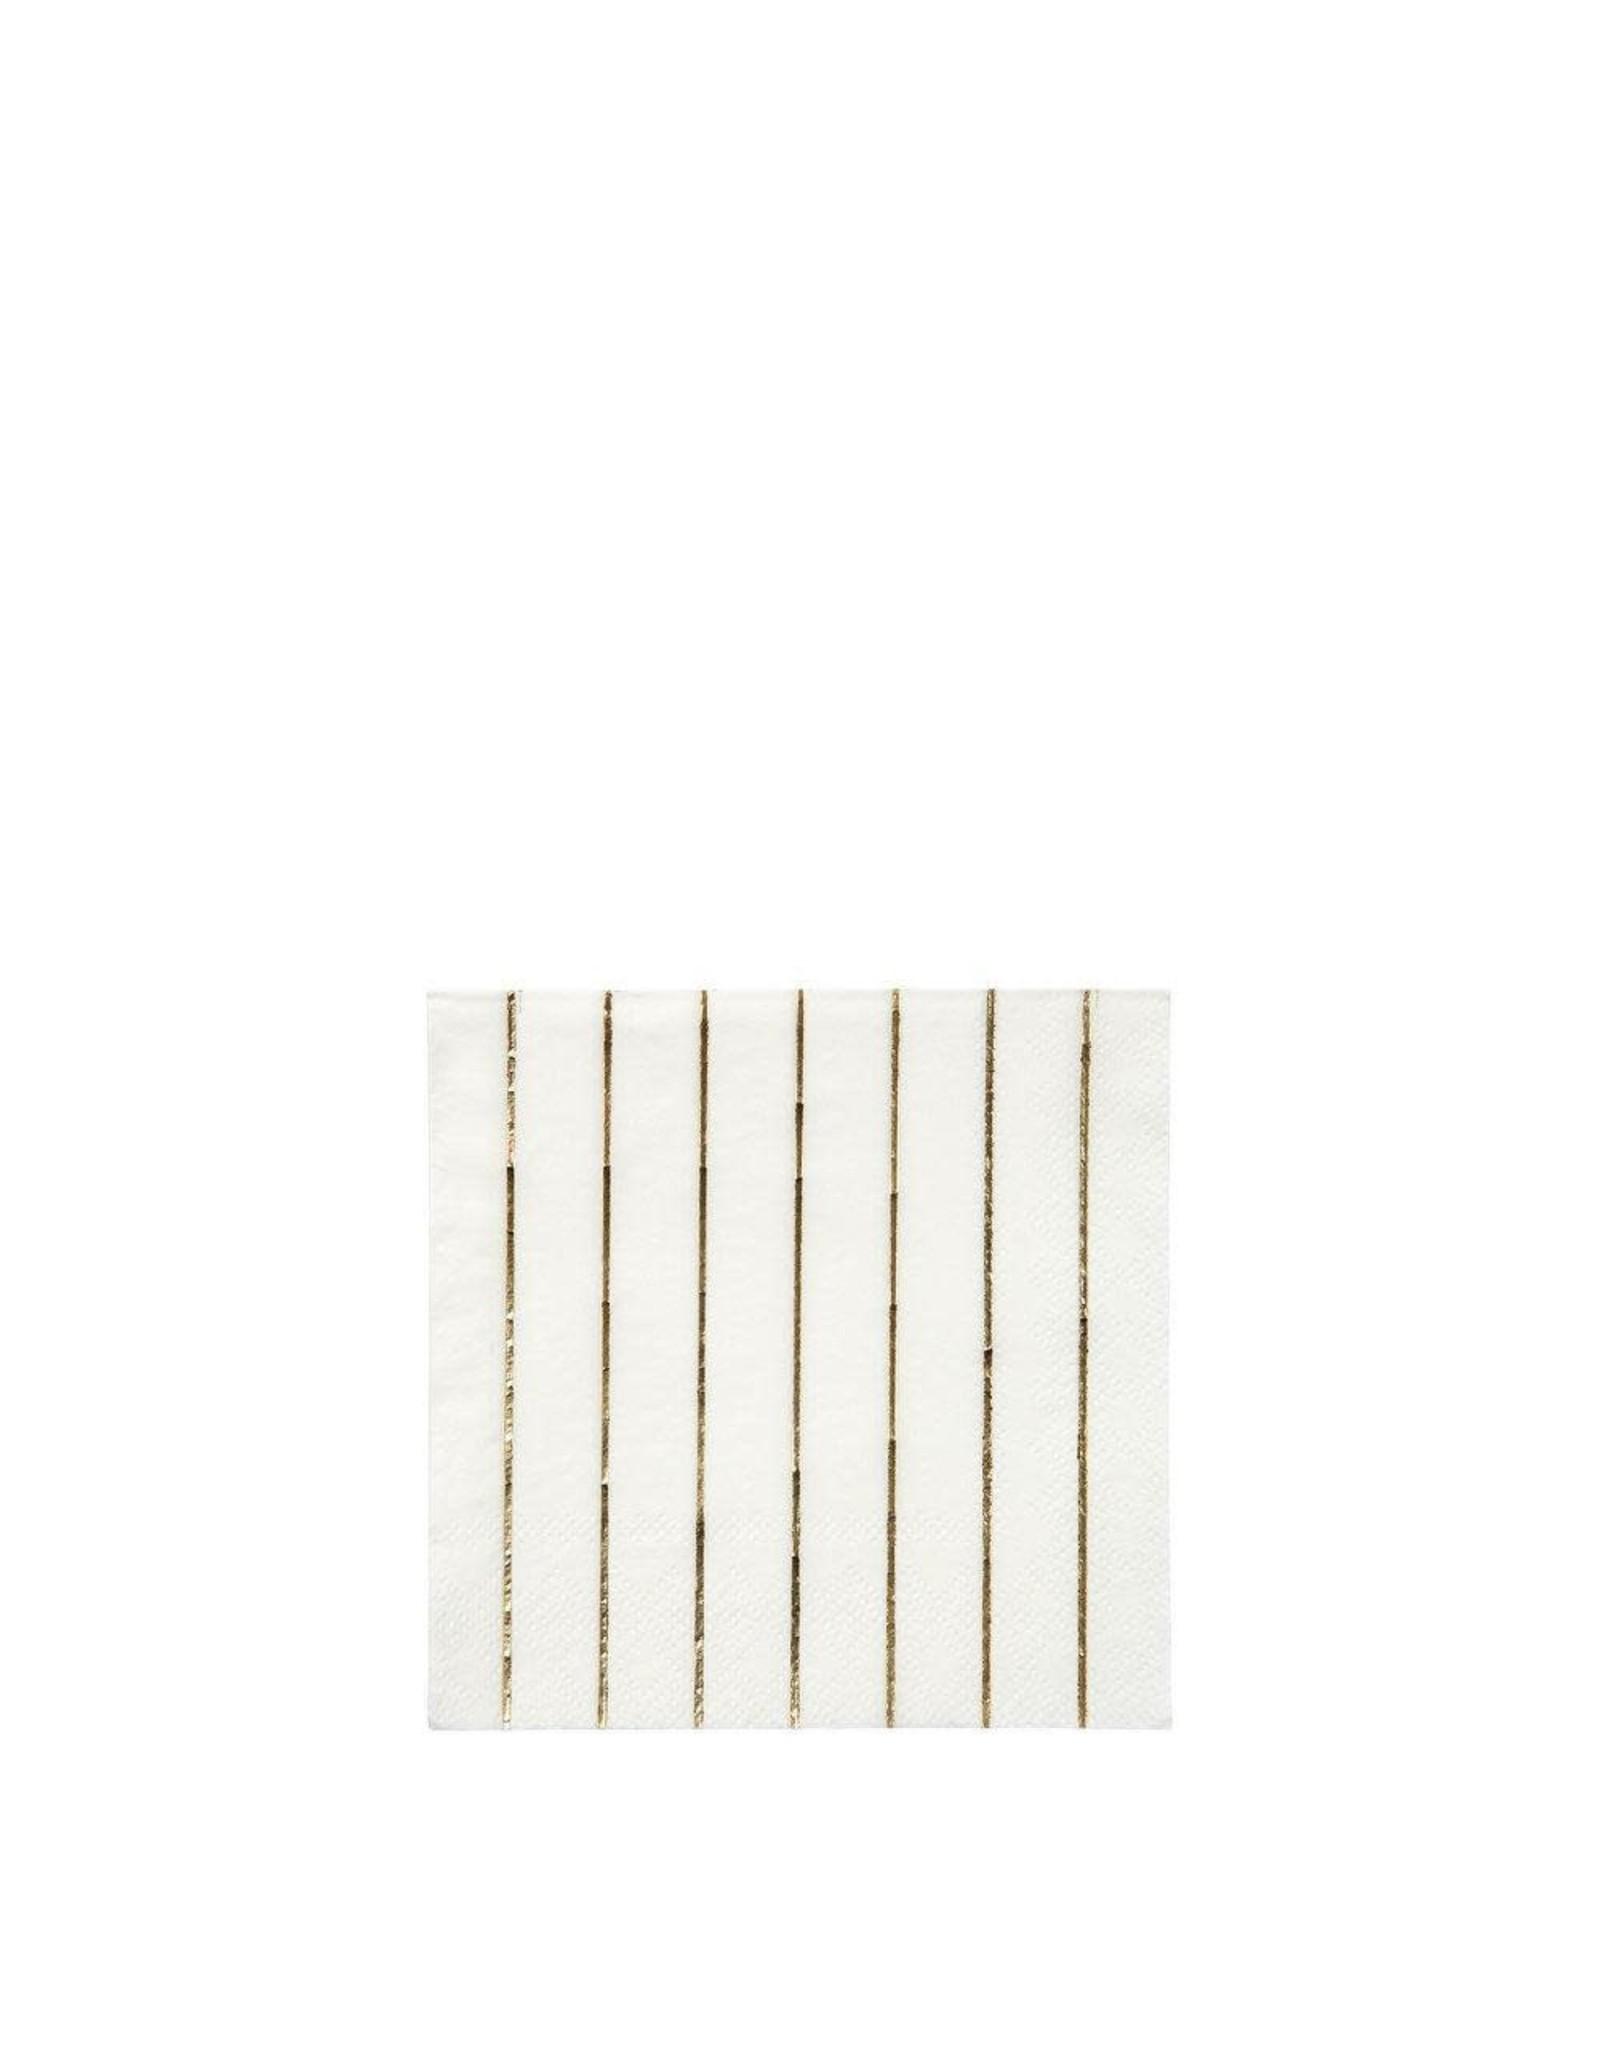 Meri Meri Serviettes | Gouden strepen | 16st | 10 x 10cm